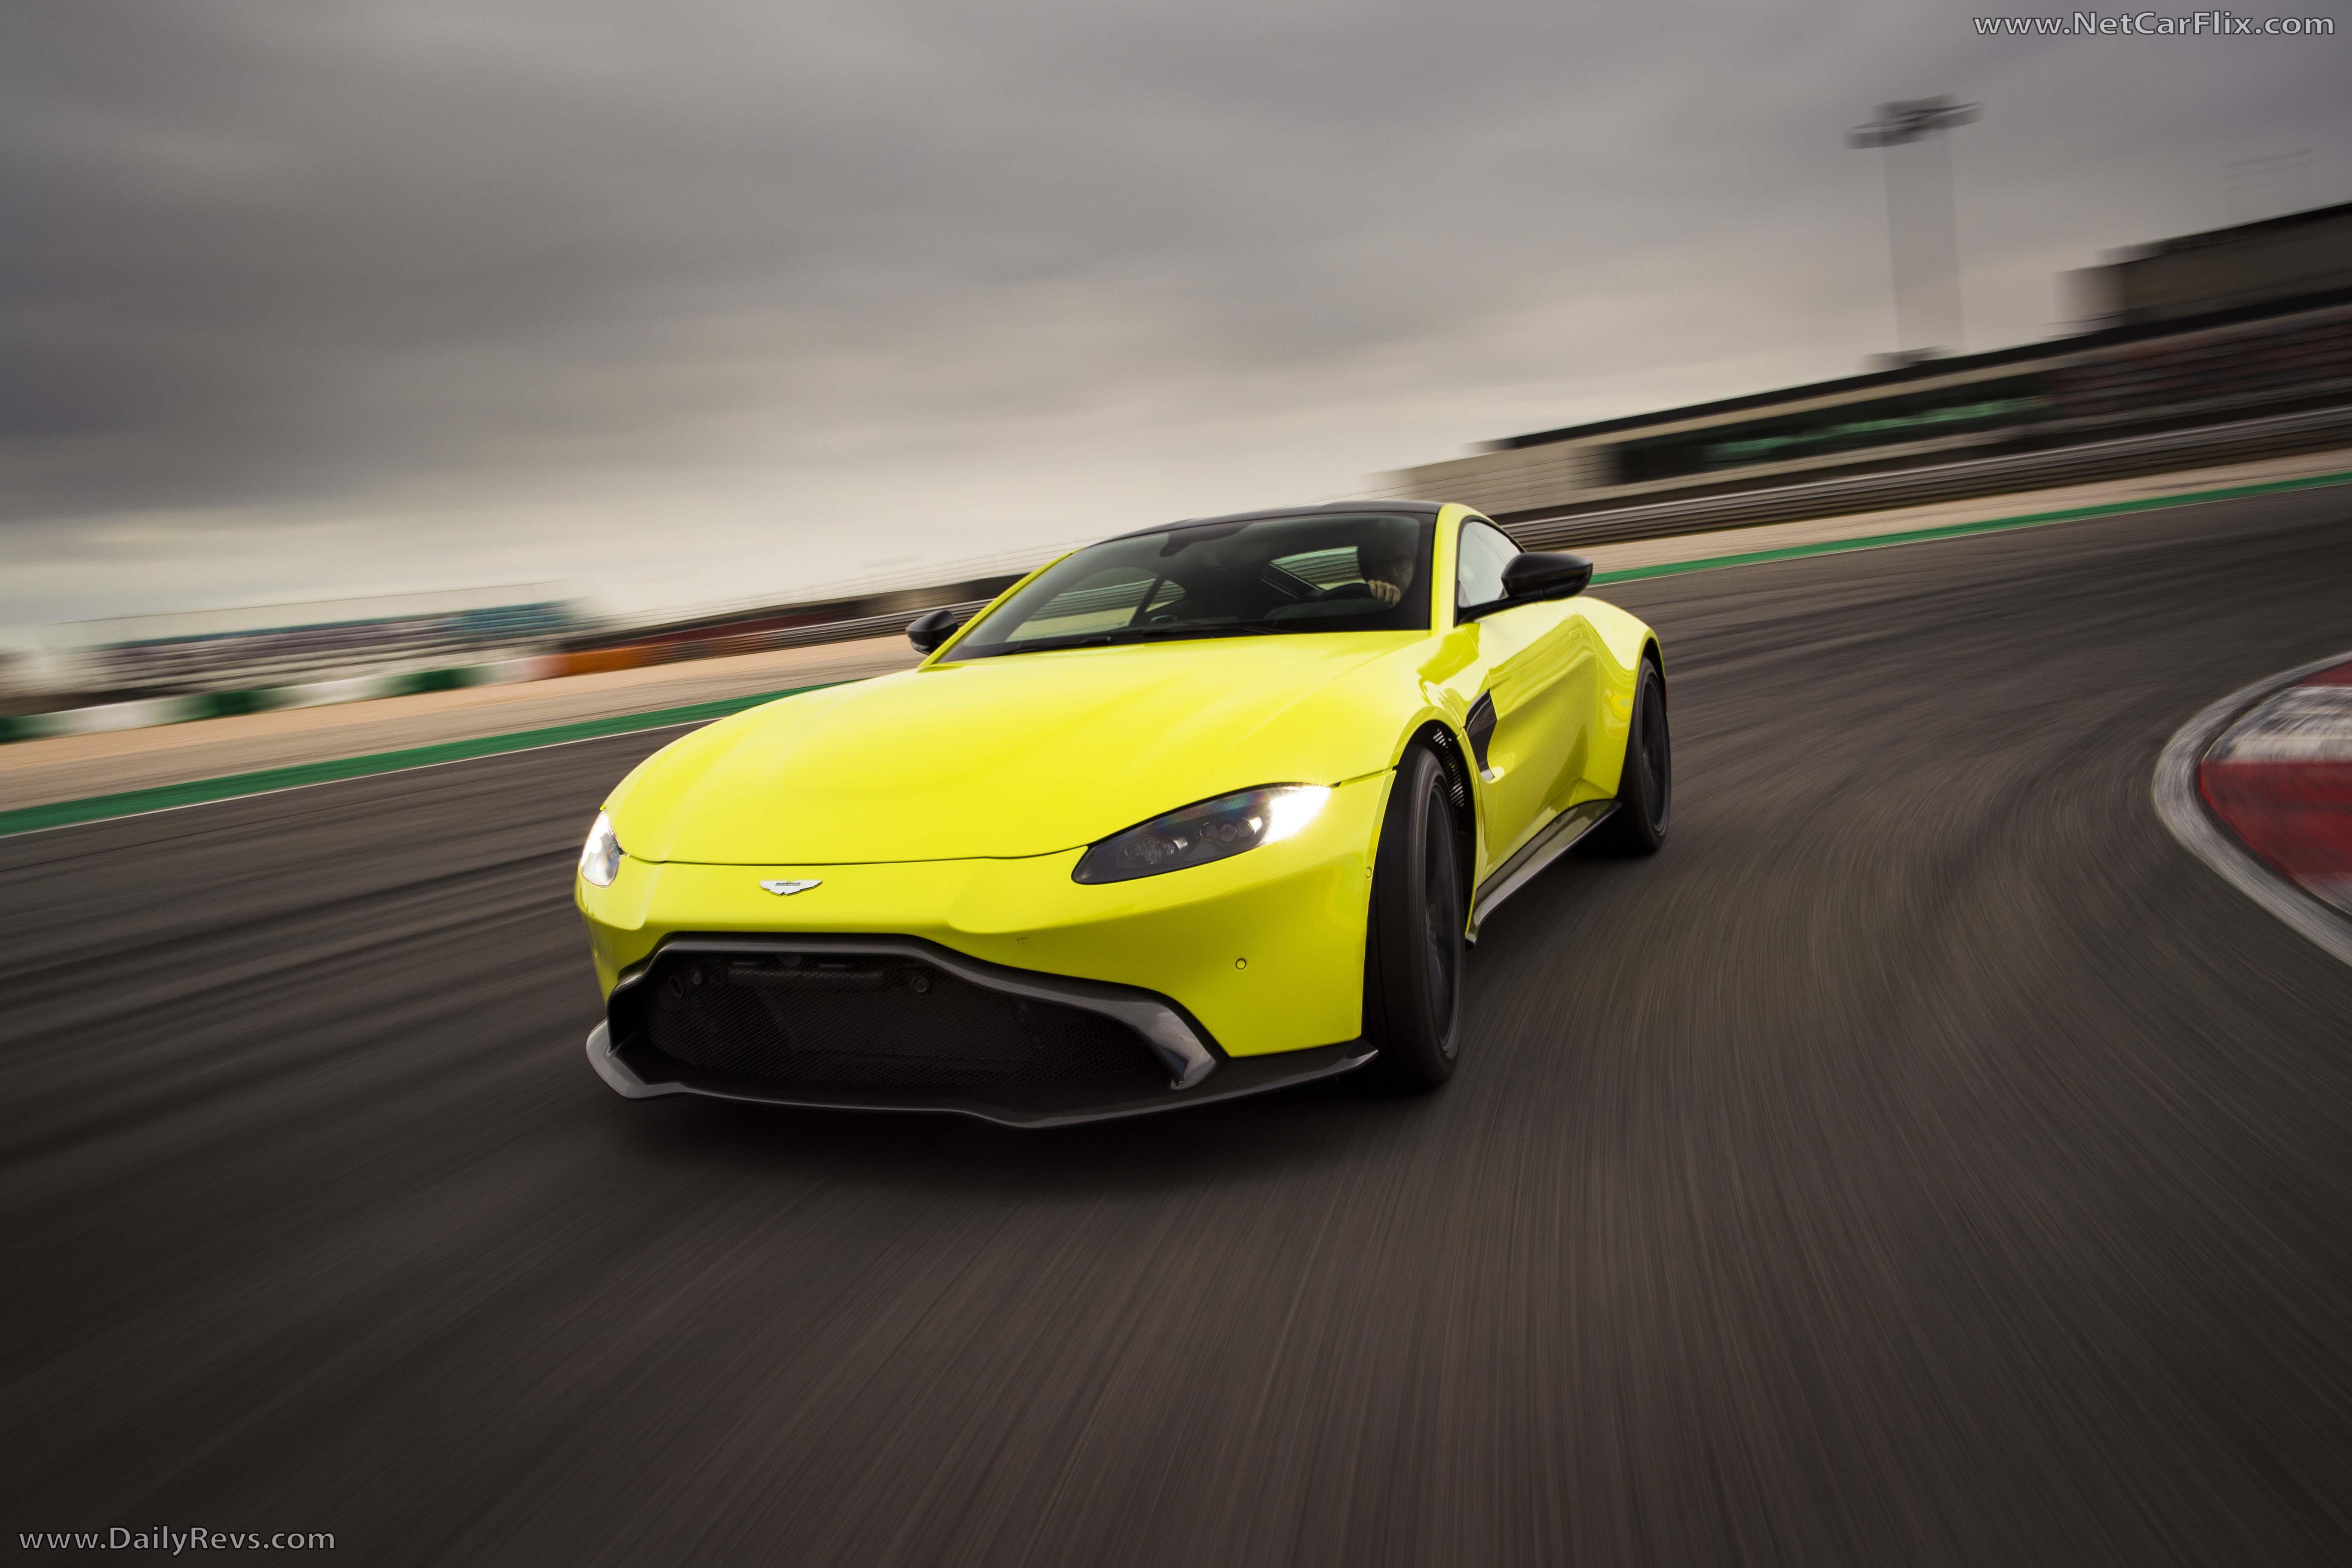 2019 Aston Martin Vantage Lime Essence Hd Pictures Videos Specs Information Dailyrevs